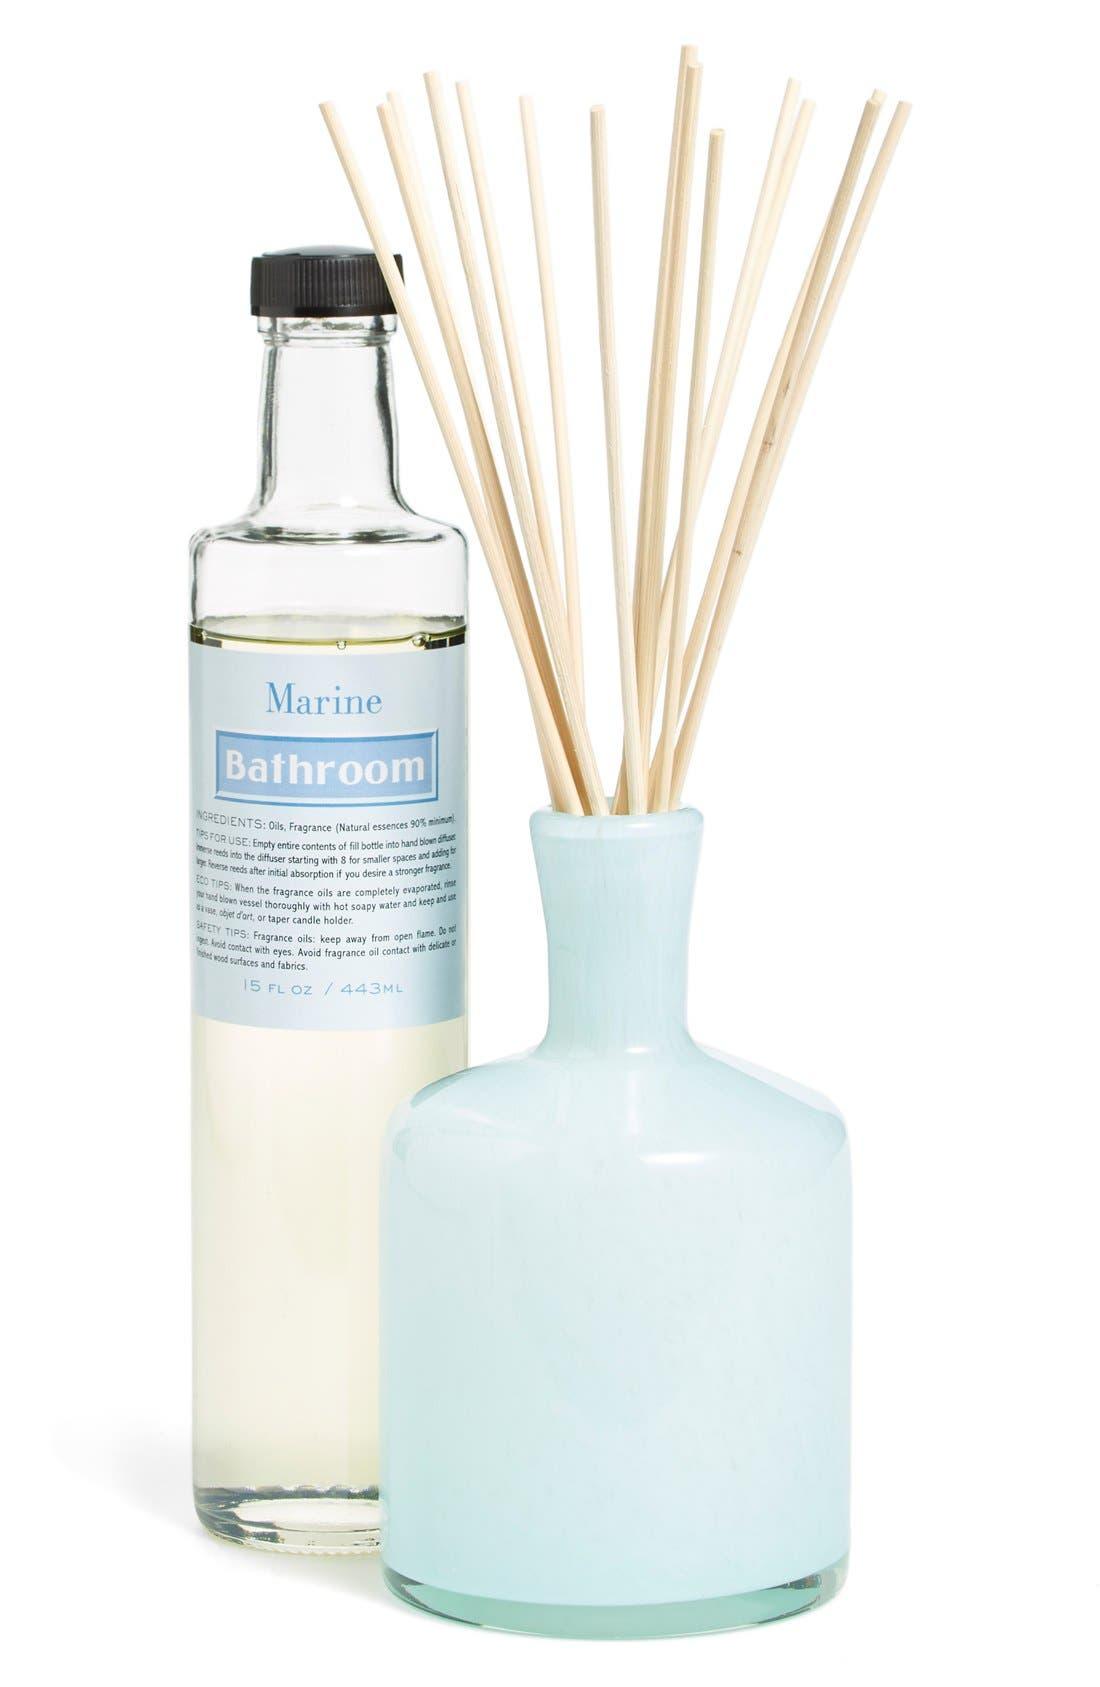 Lafco 'Marine - Bathroom' Fragrance Diffuser